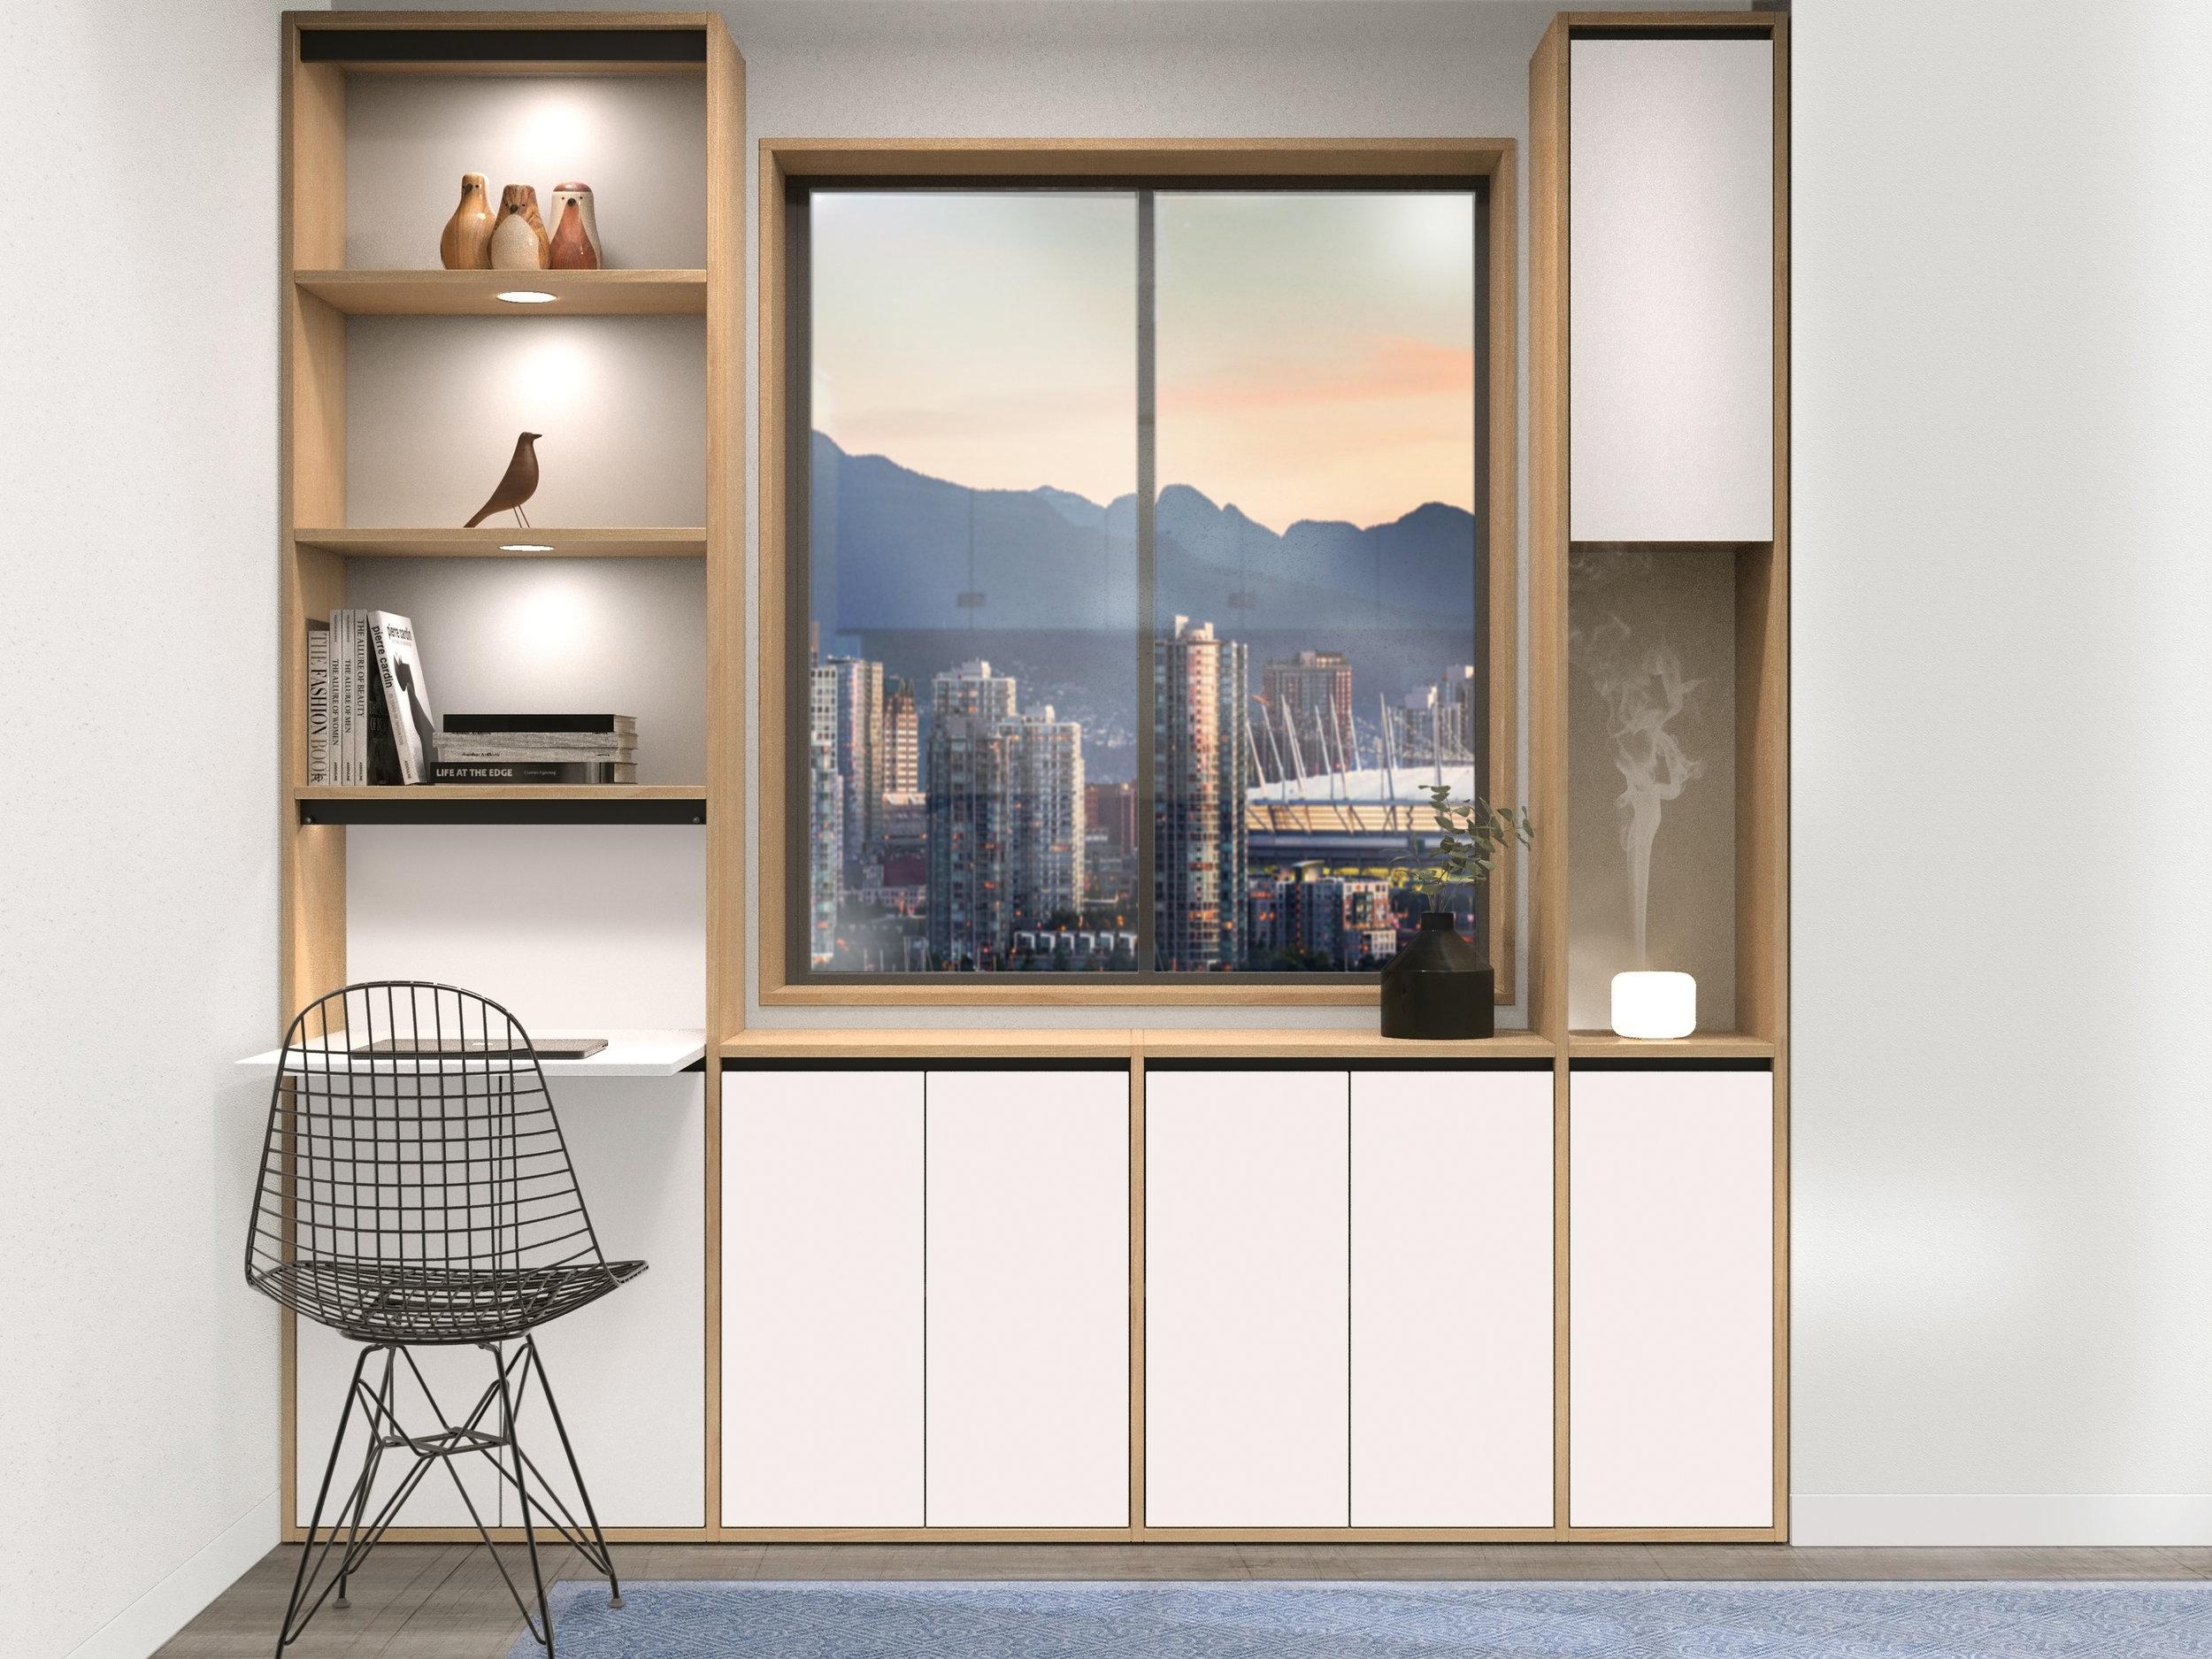 Built in Cabinetry Custom Millwork Foldaway Desk Vancouver Anthill Nexus.jpg